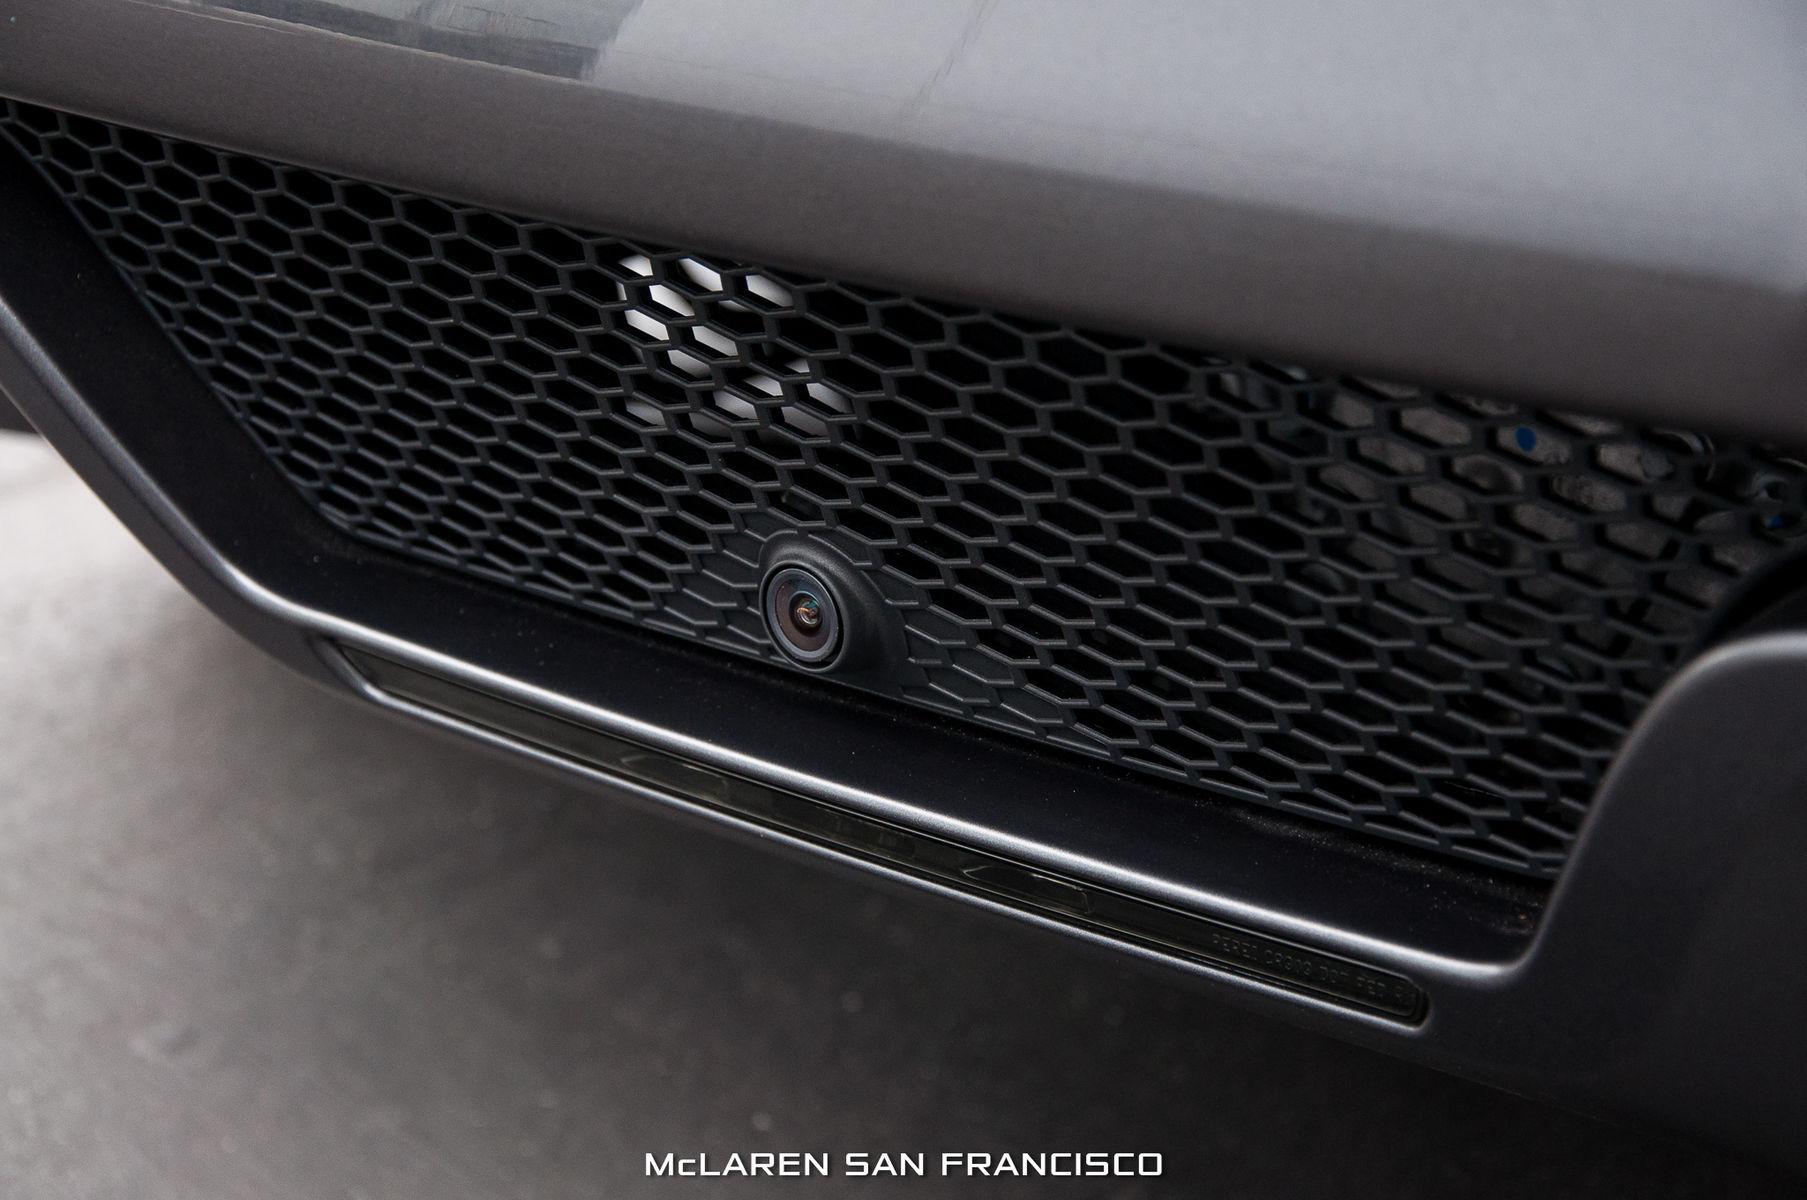 2014 McLaren MP4-12C Spider | 650S 12C Spider 4087